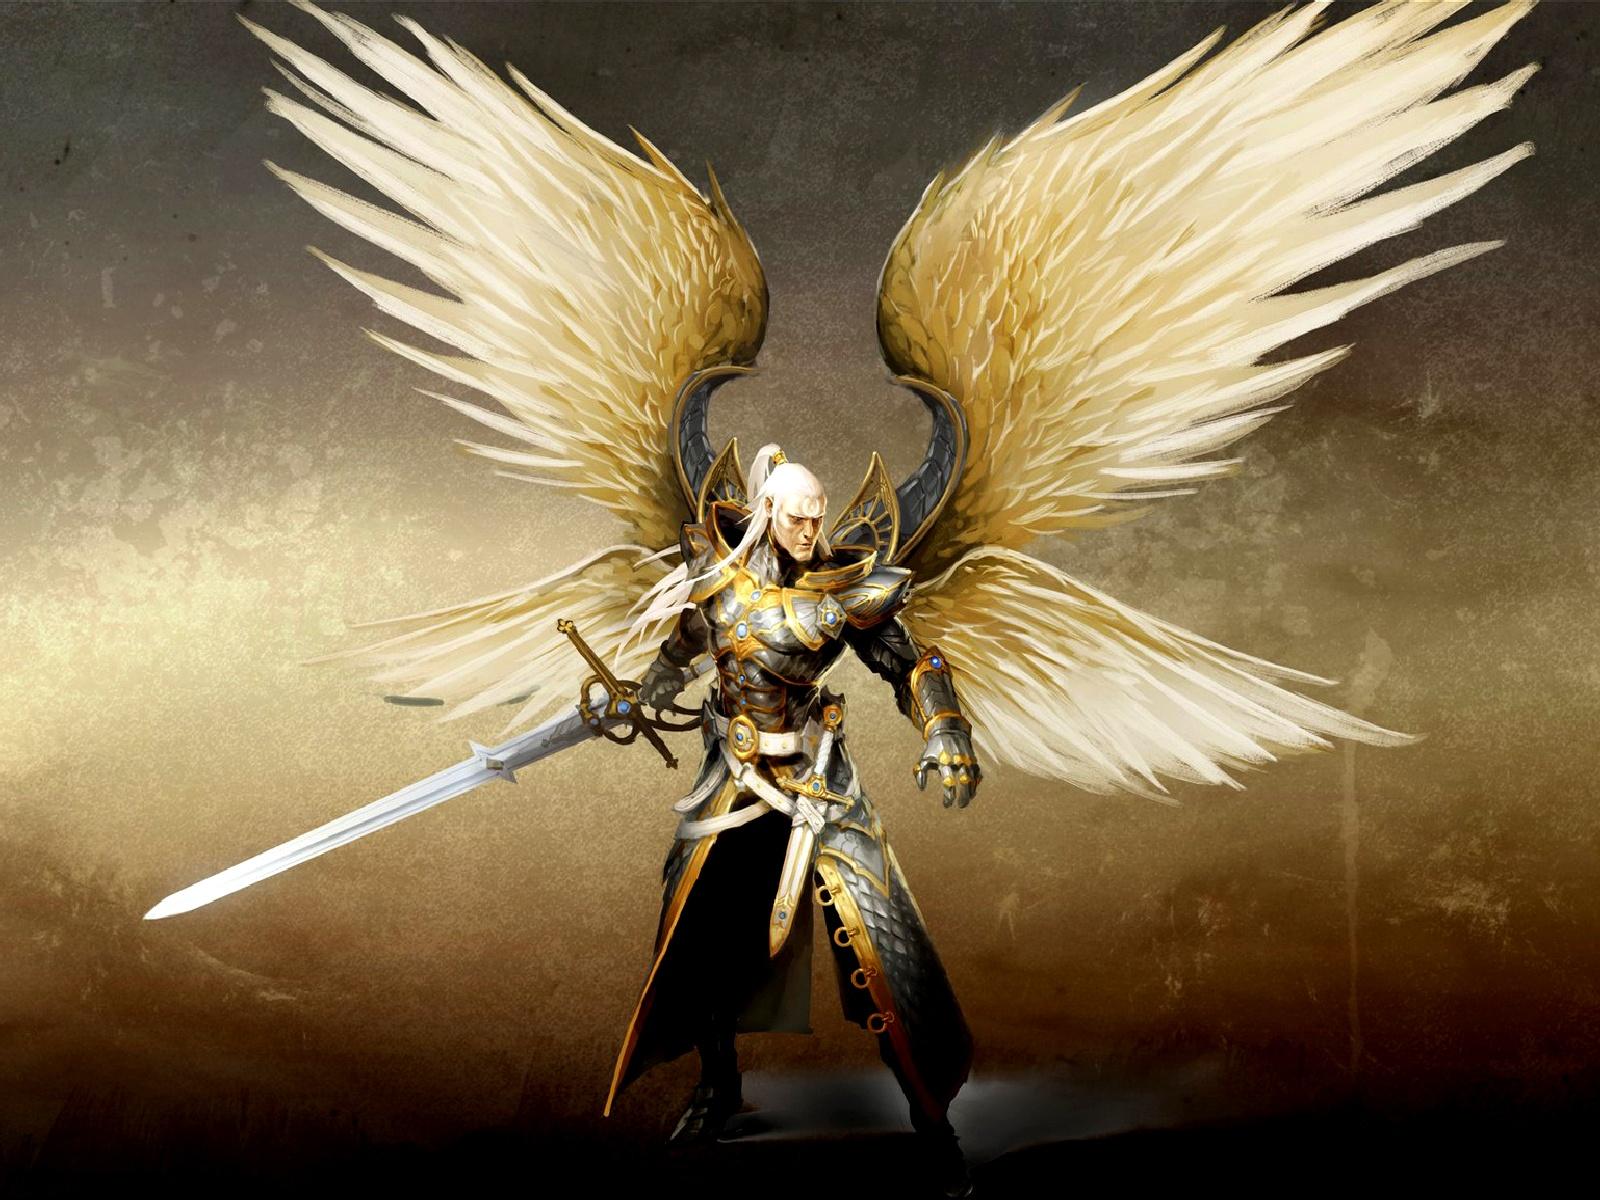 warrior-angel.jpg